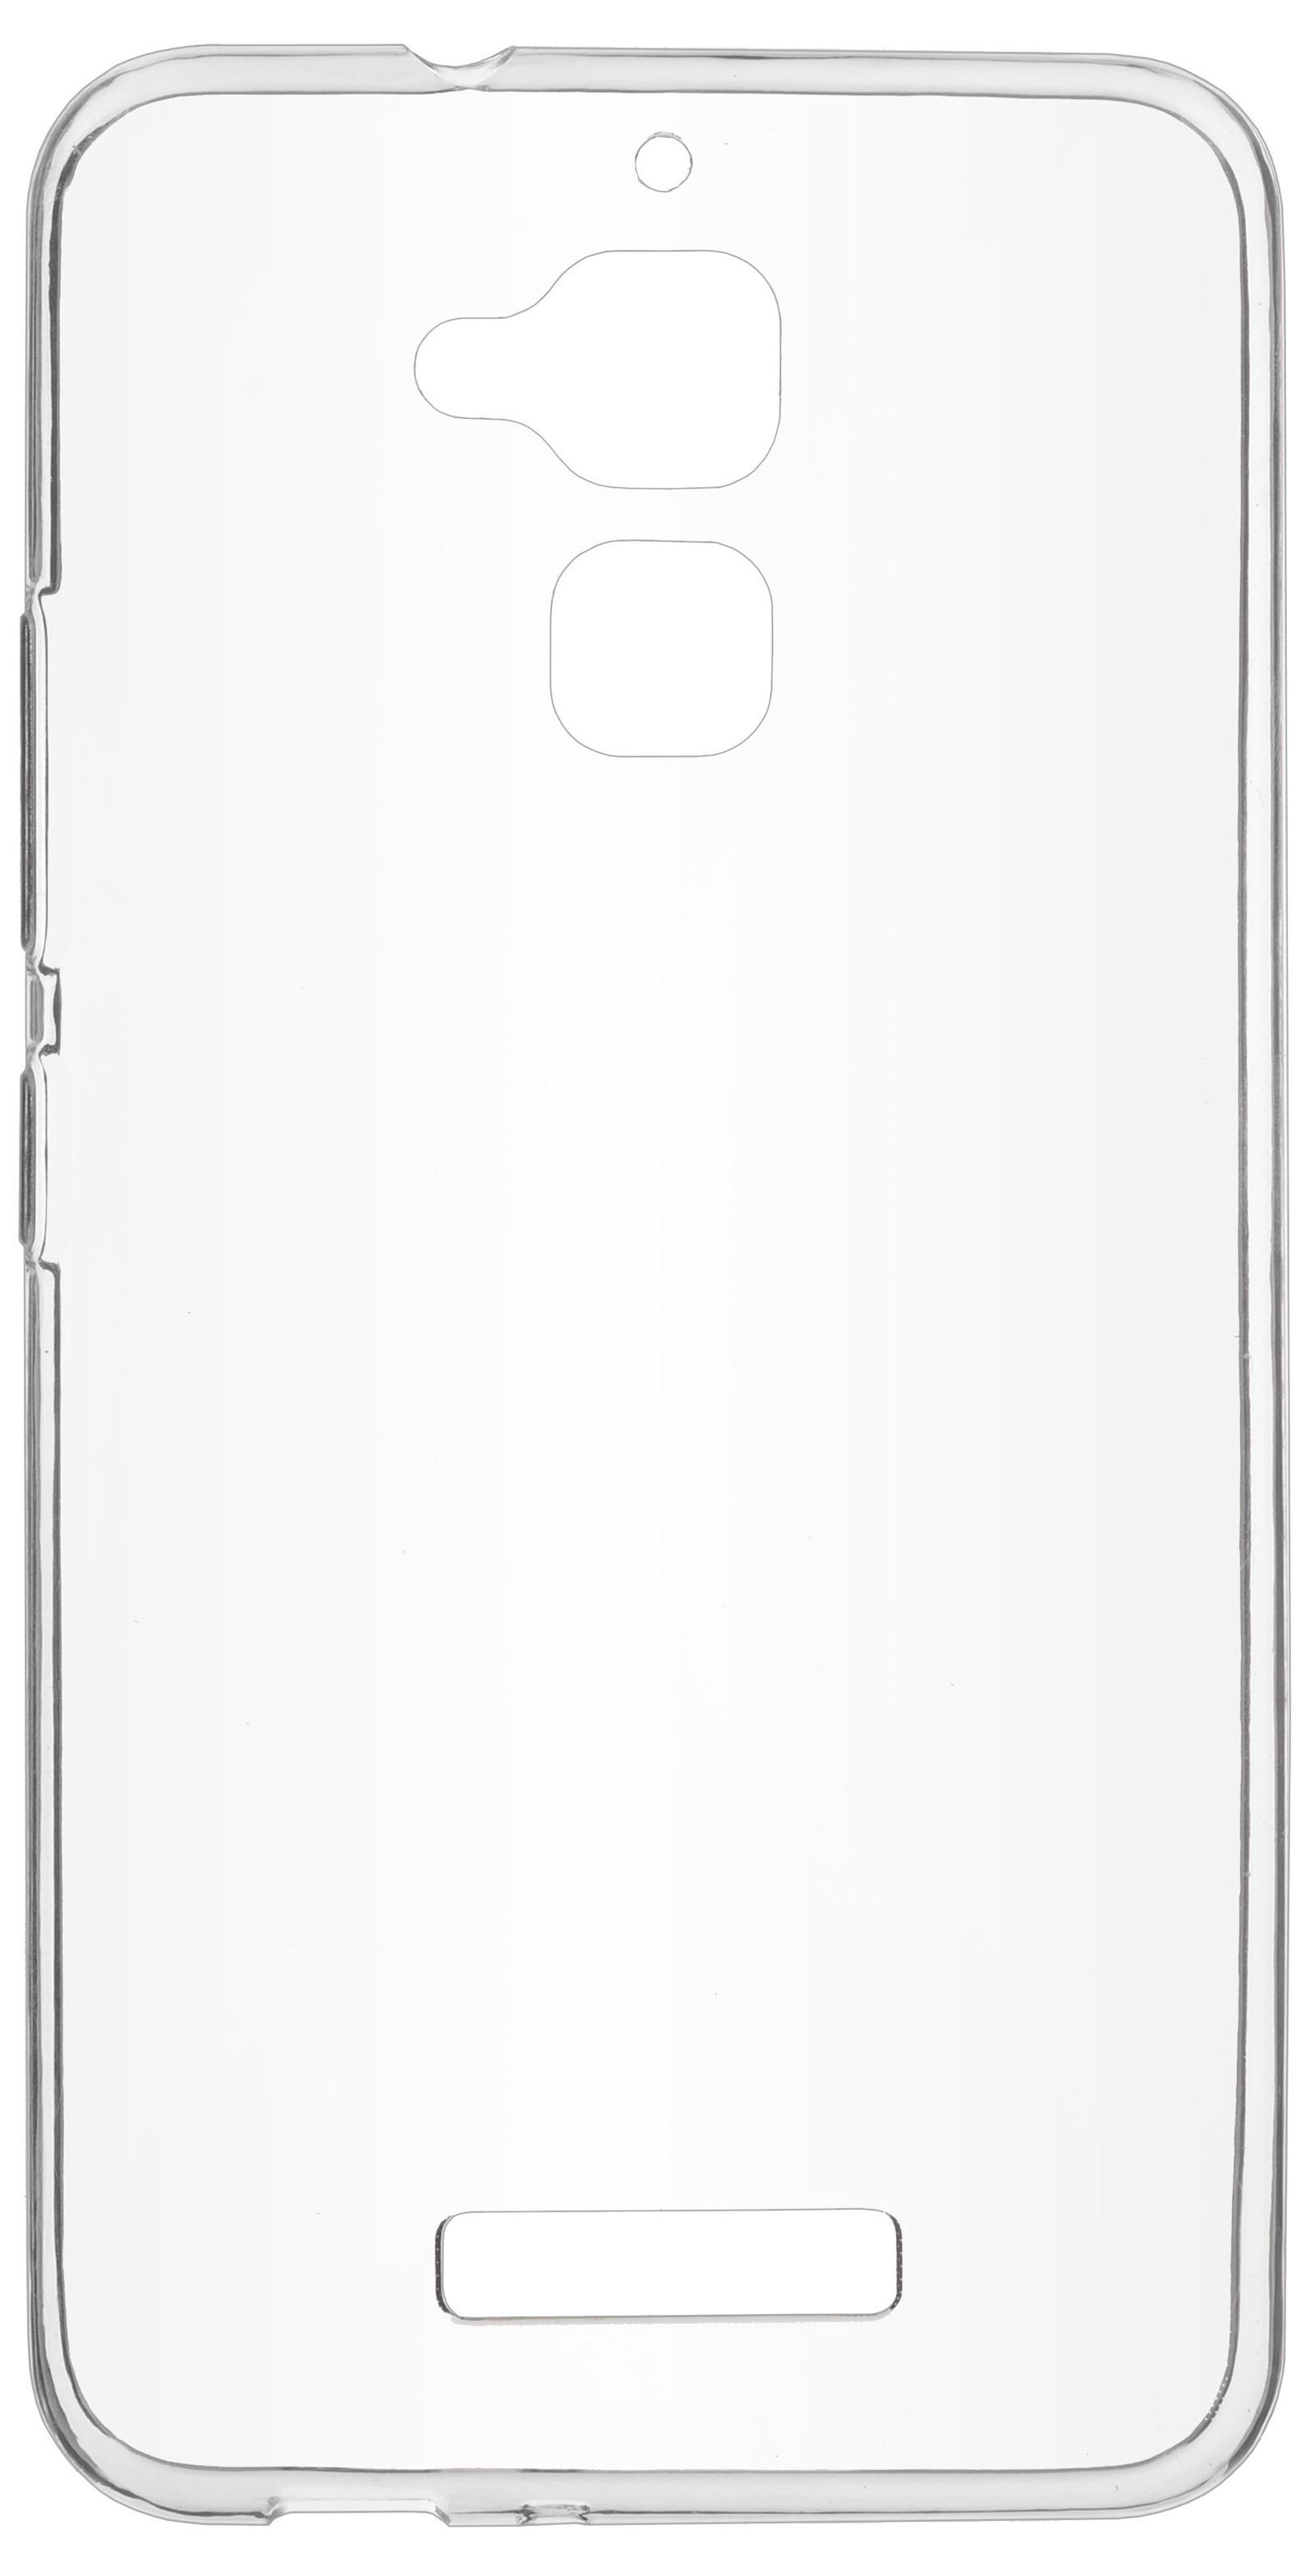 Чехол для сотового телефона skinBOX Slim Silicone, 4660041407761, прозрачный цена и фото